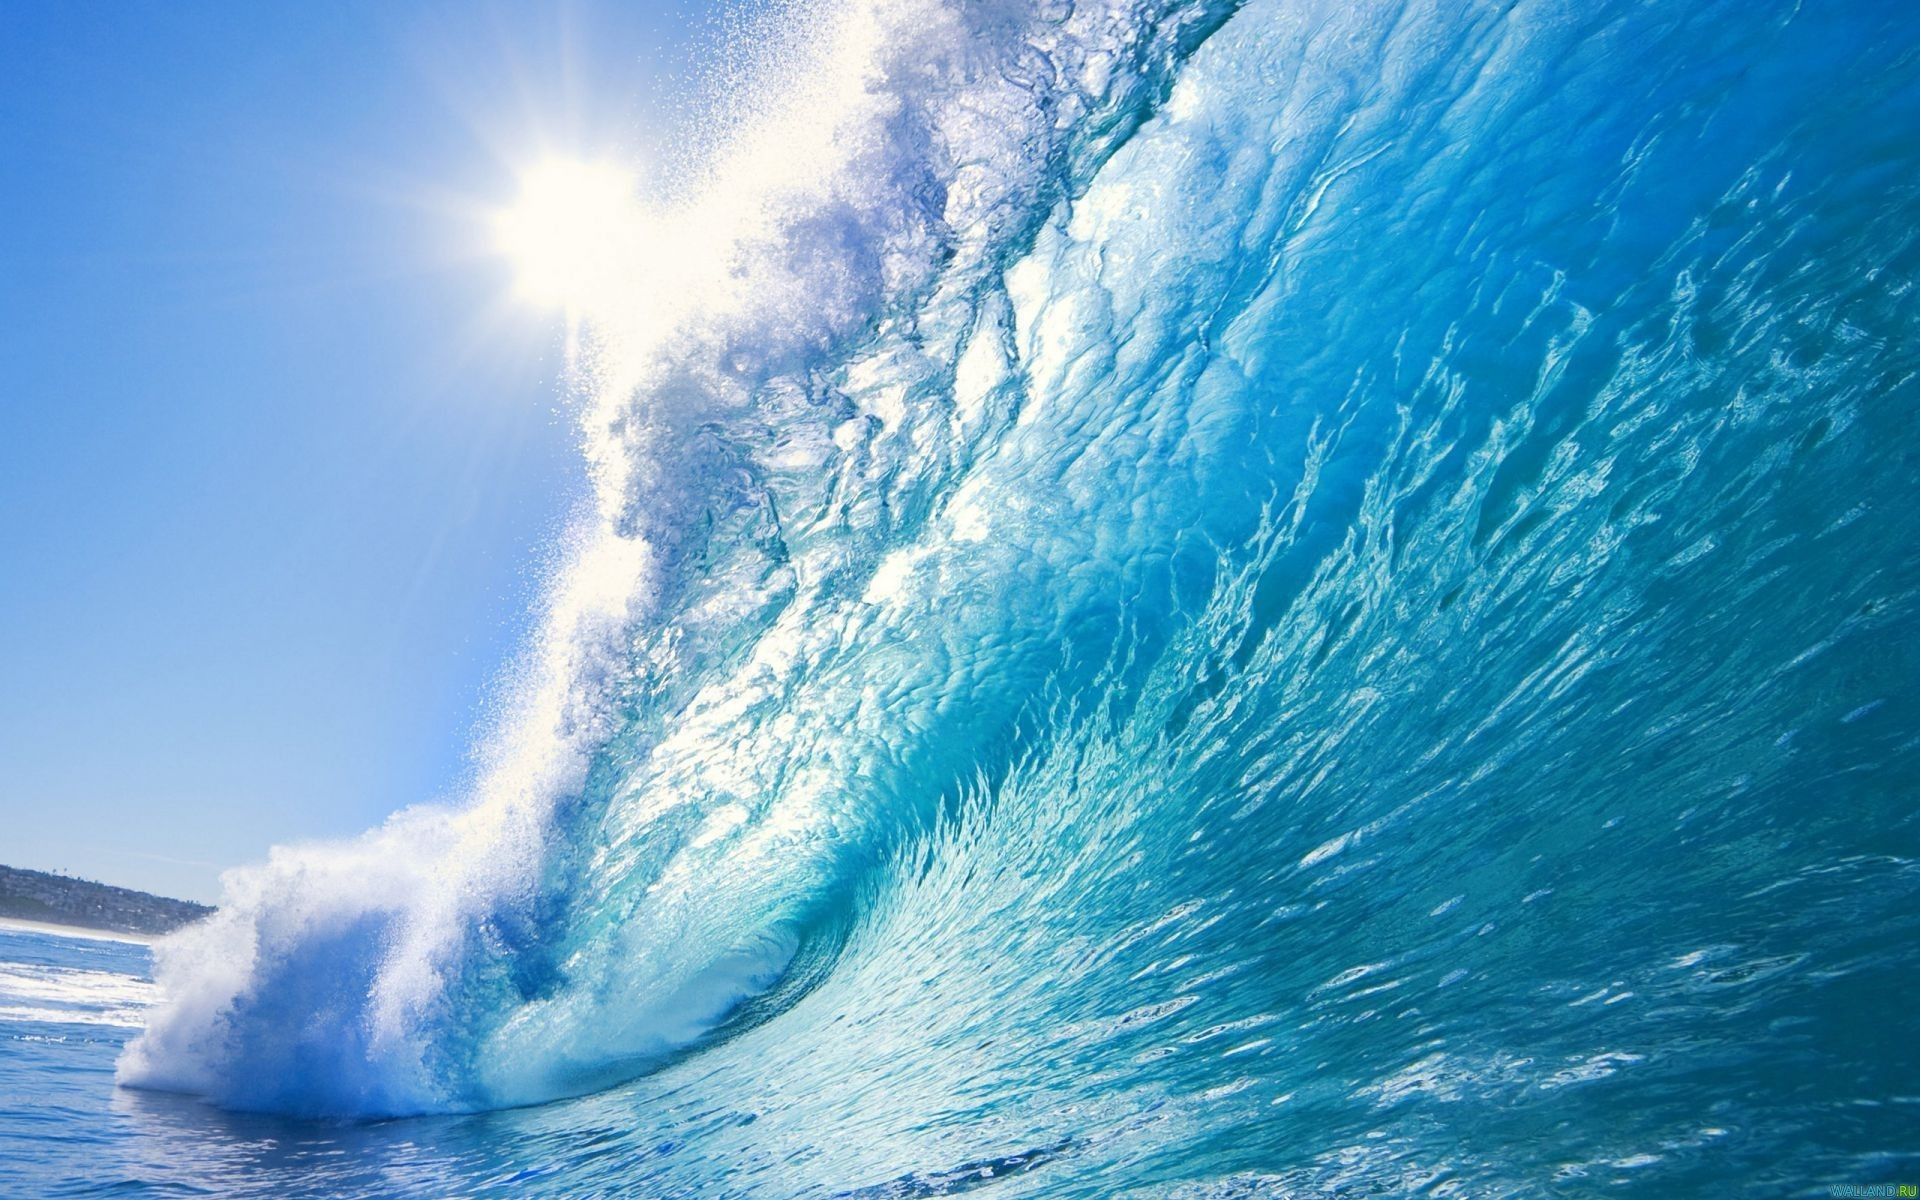 Beautiful Ocean Waves Wallpaper